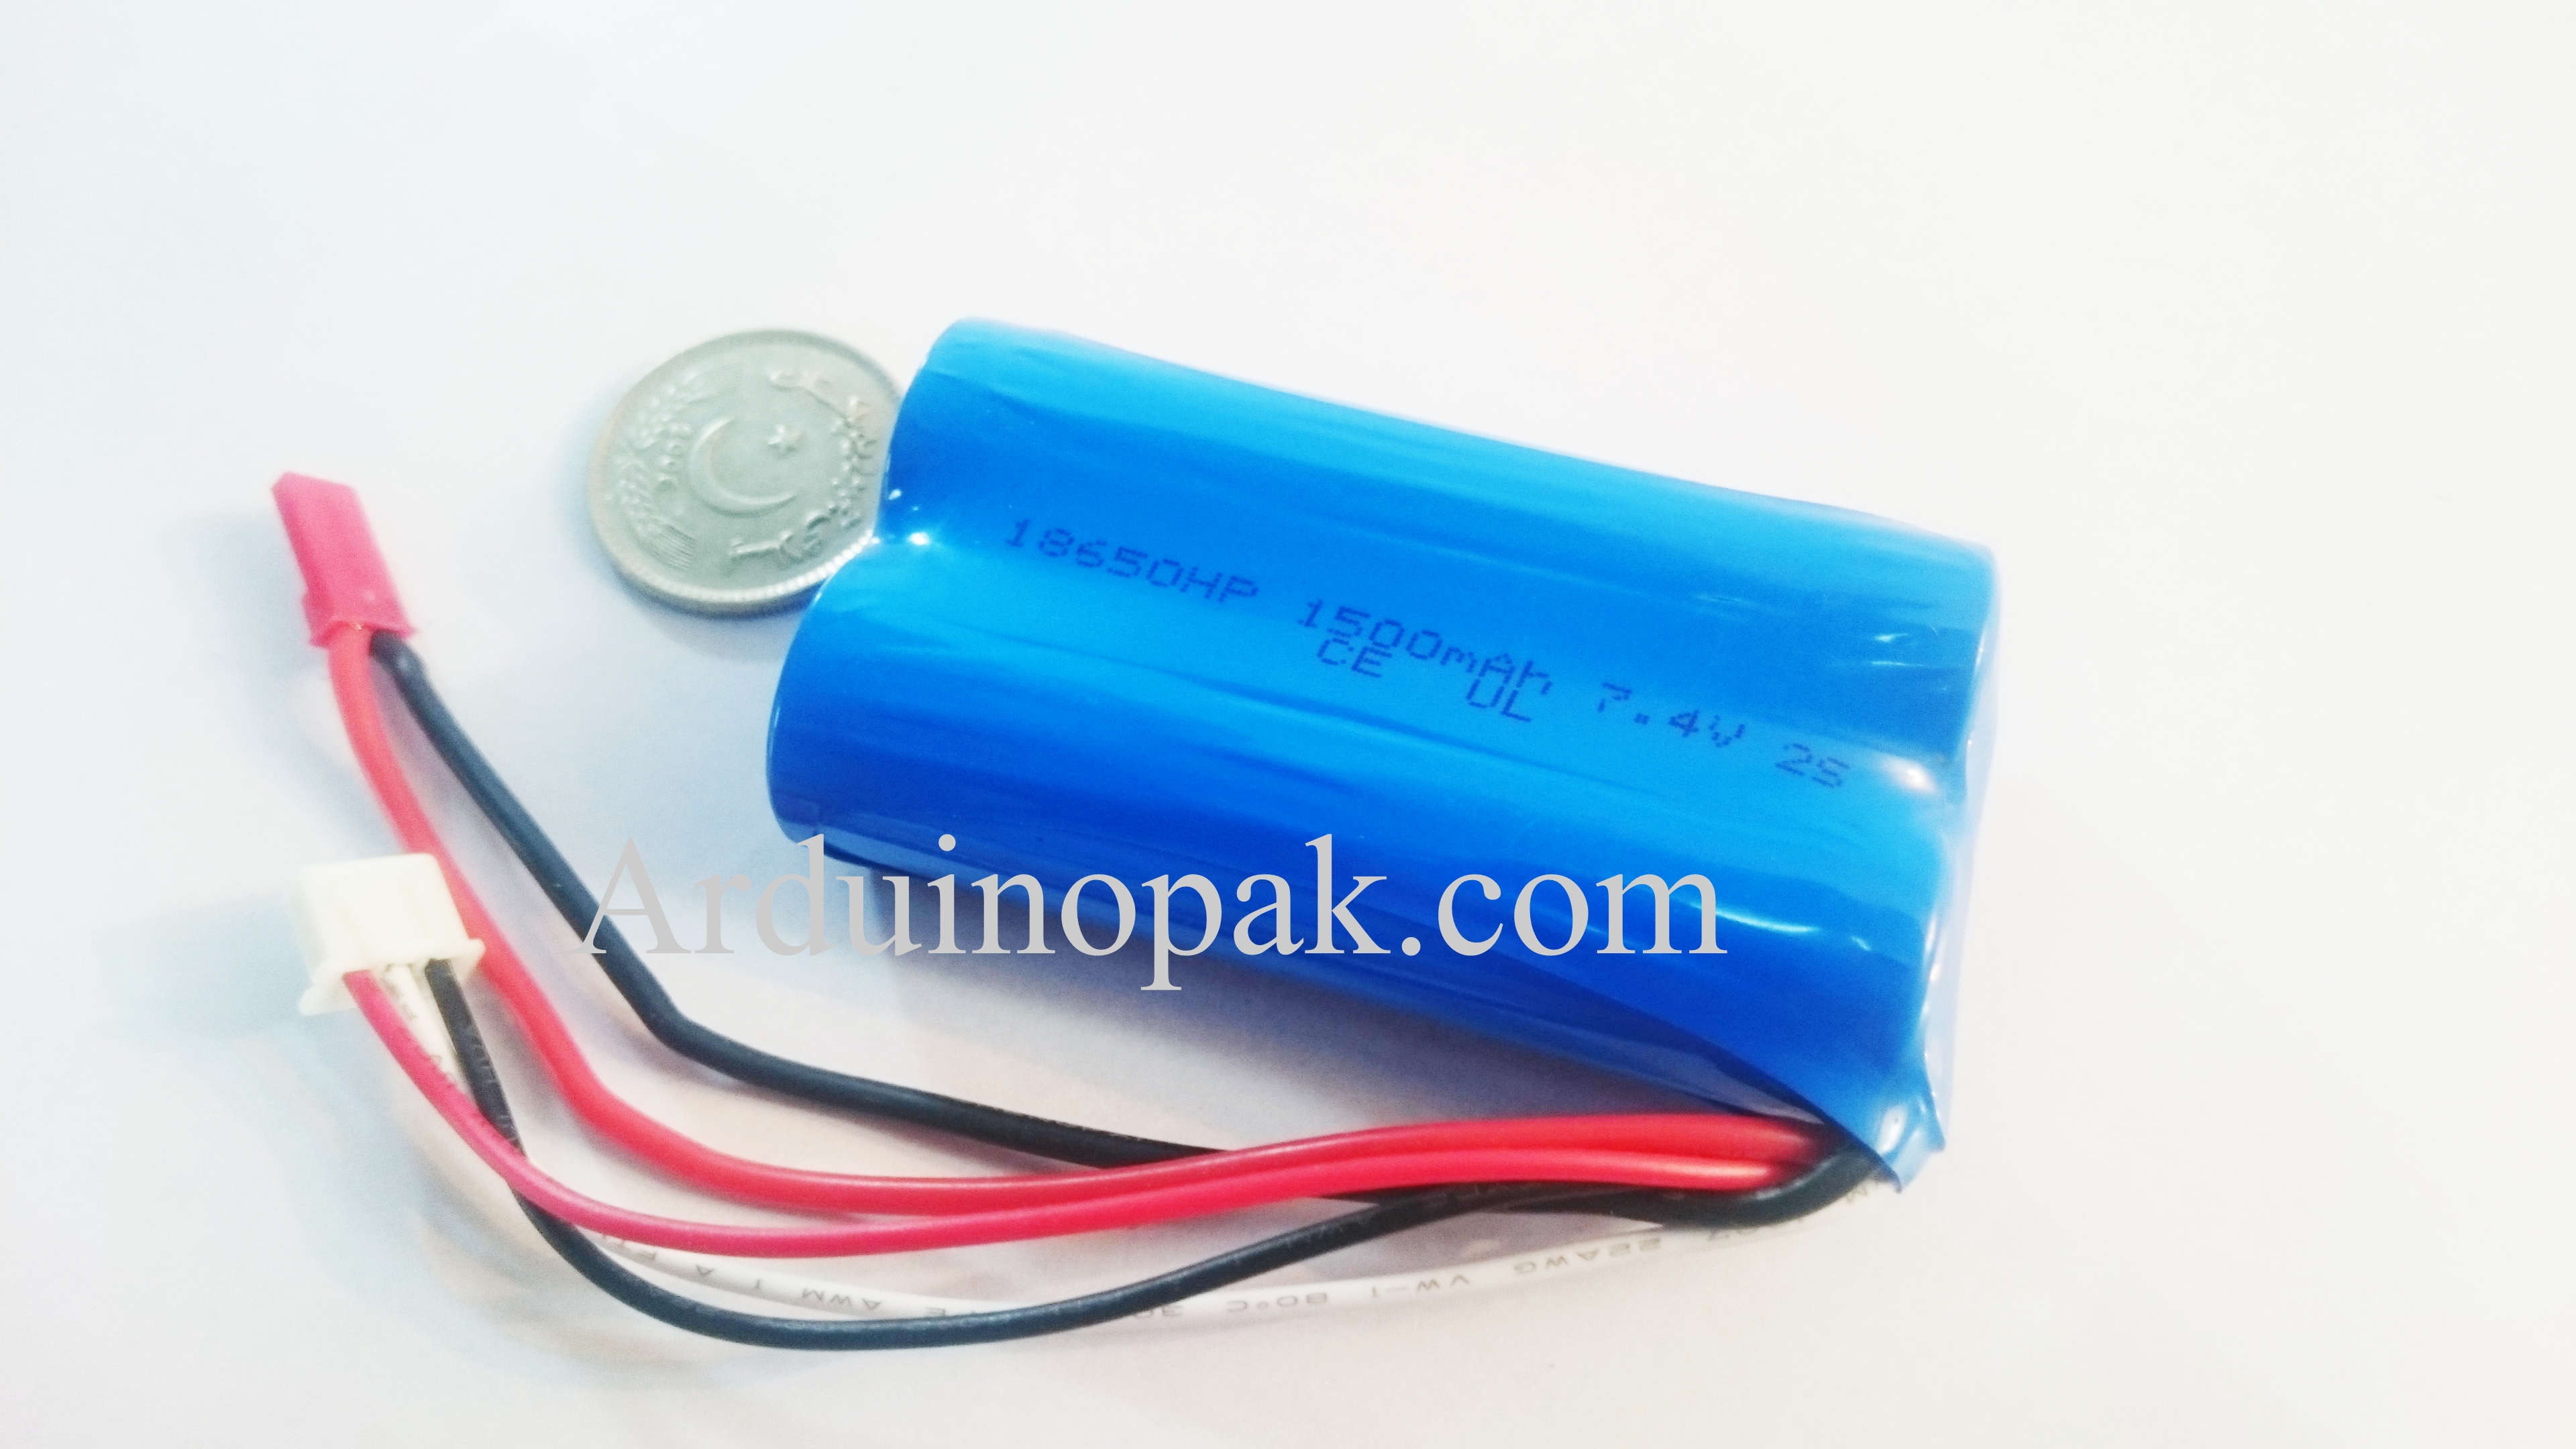 7.4V 1500mAh 25C Lipo battery